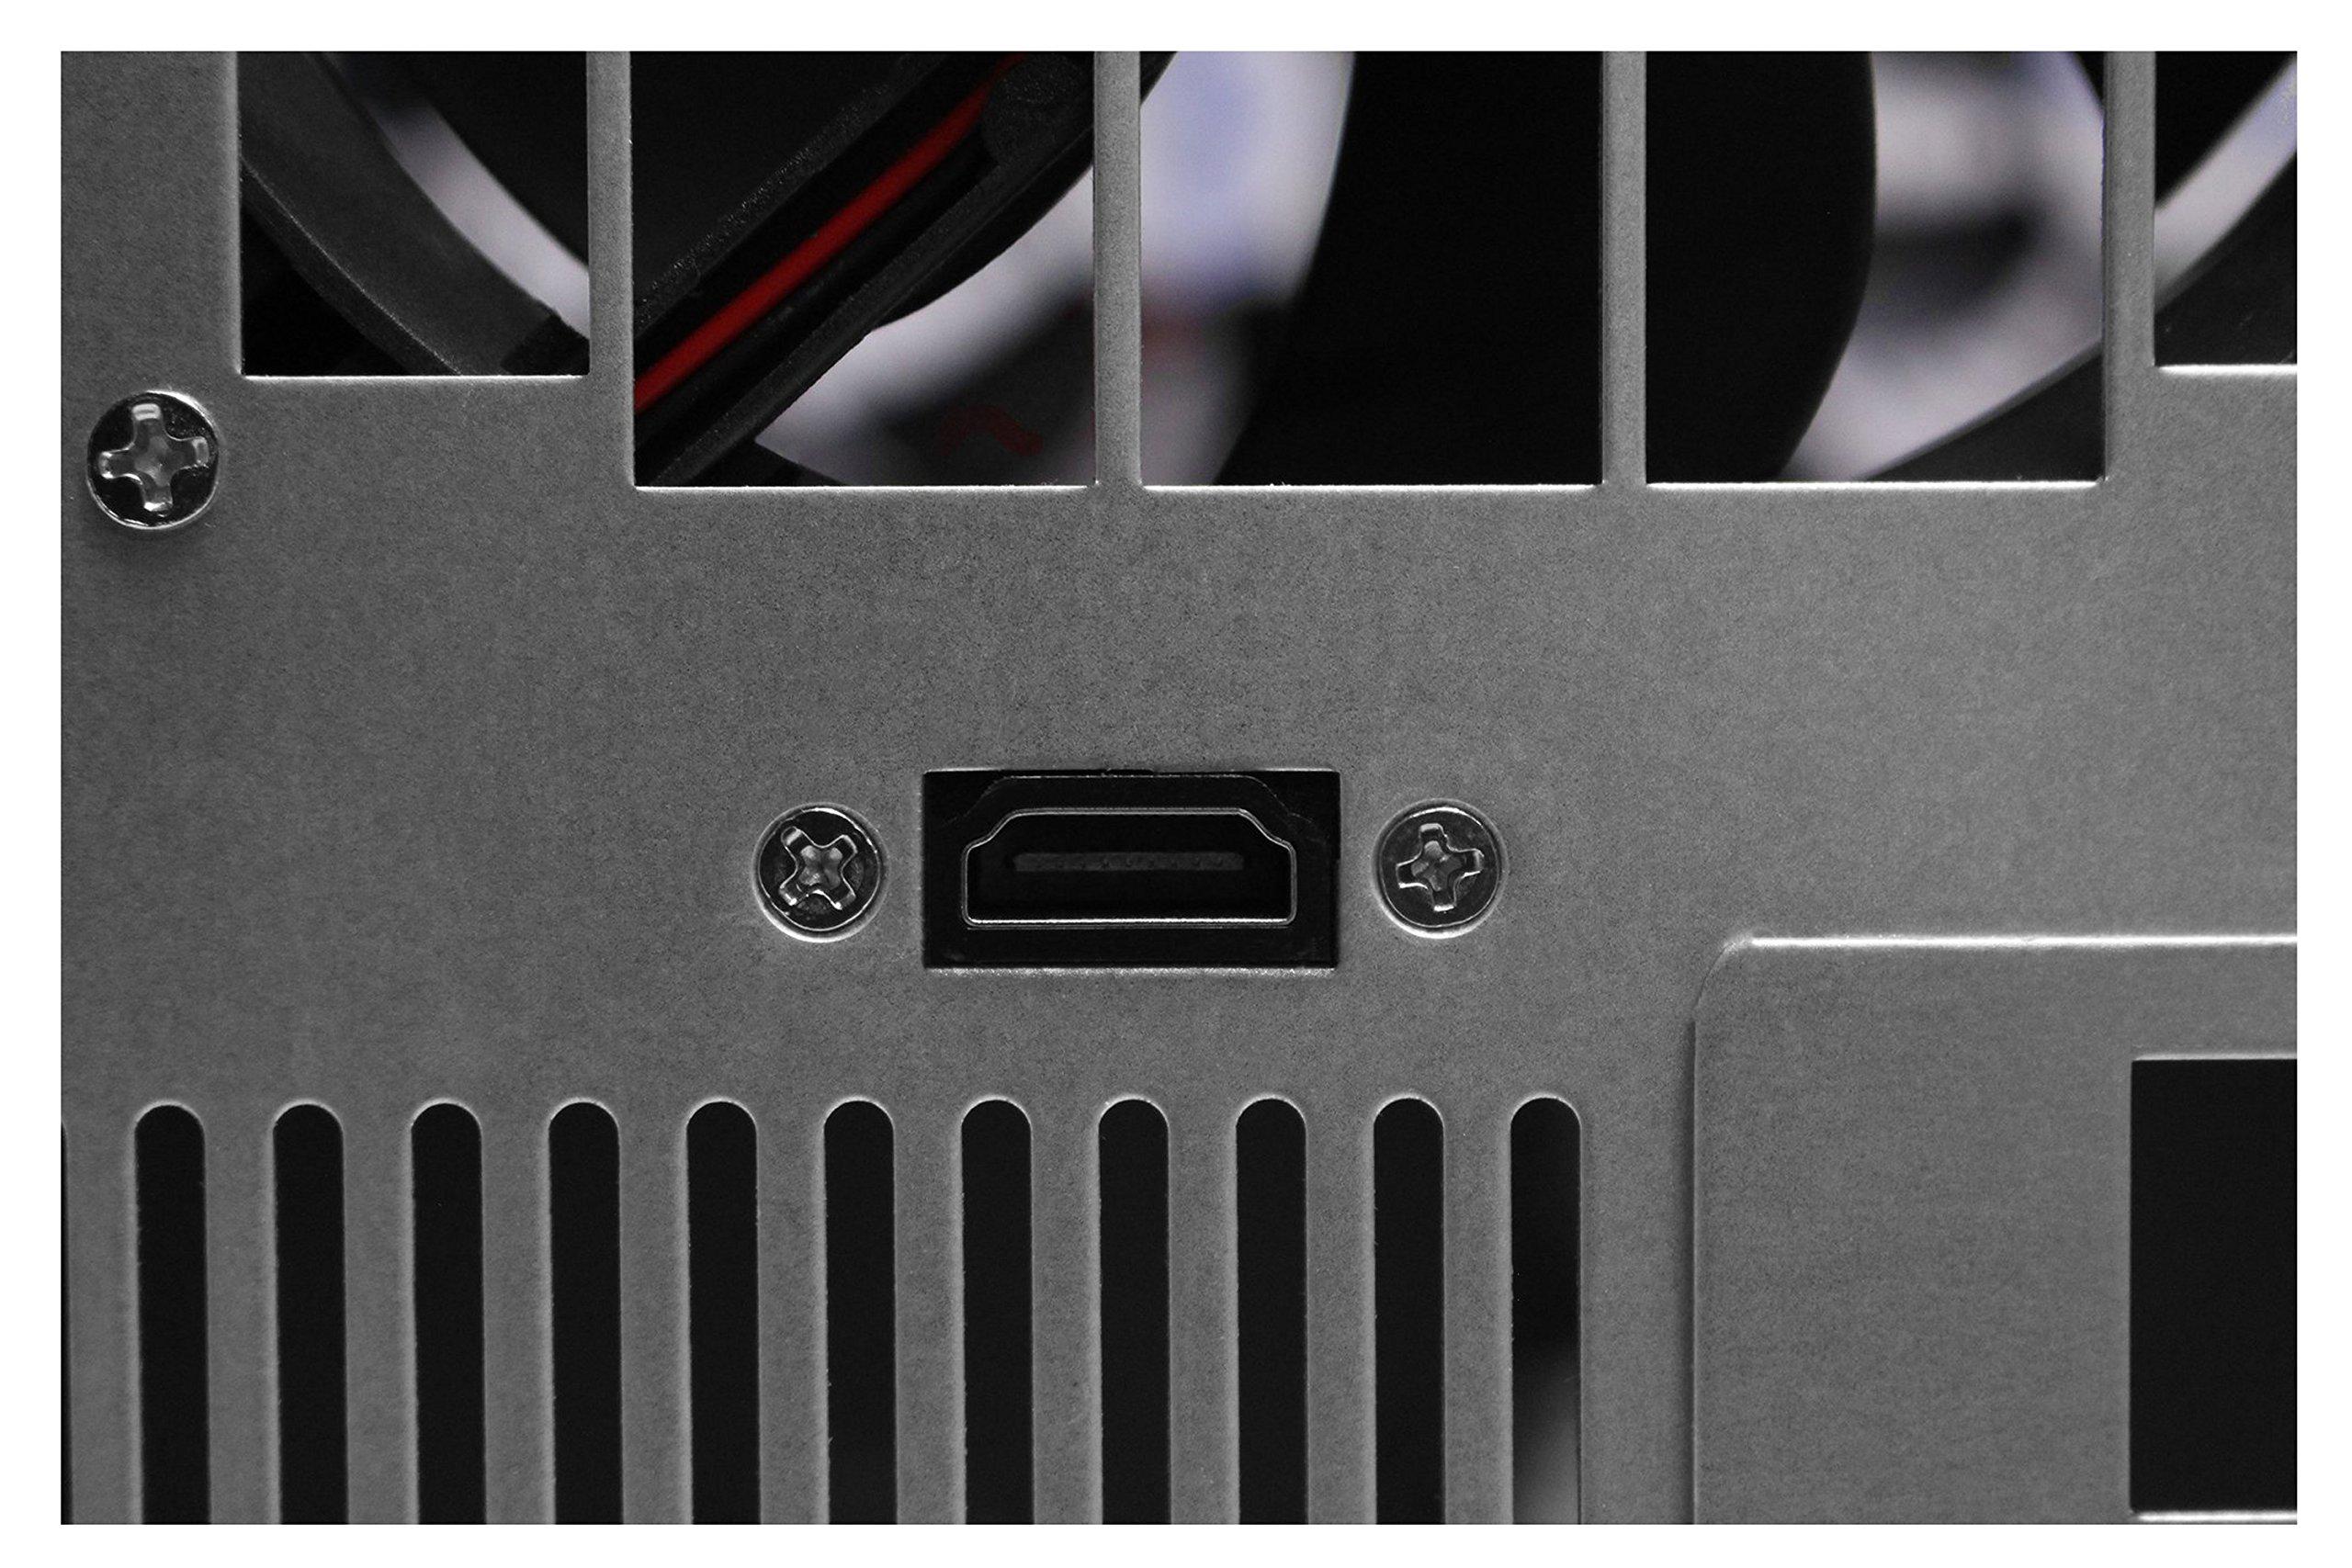 Ledgerware 13 GPU Mining Case